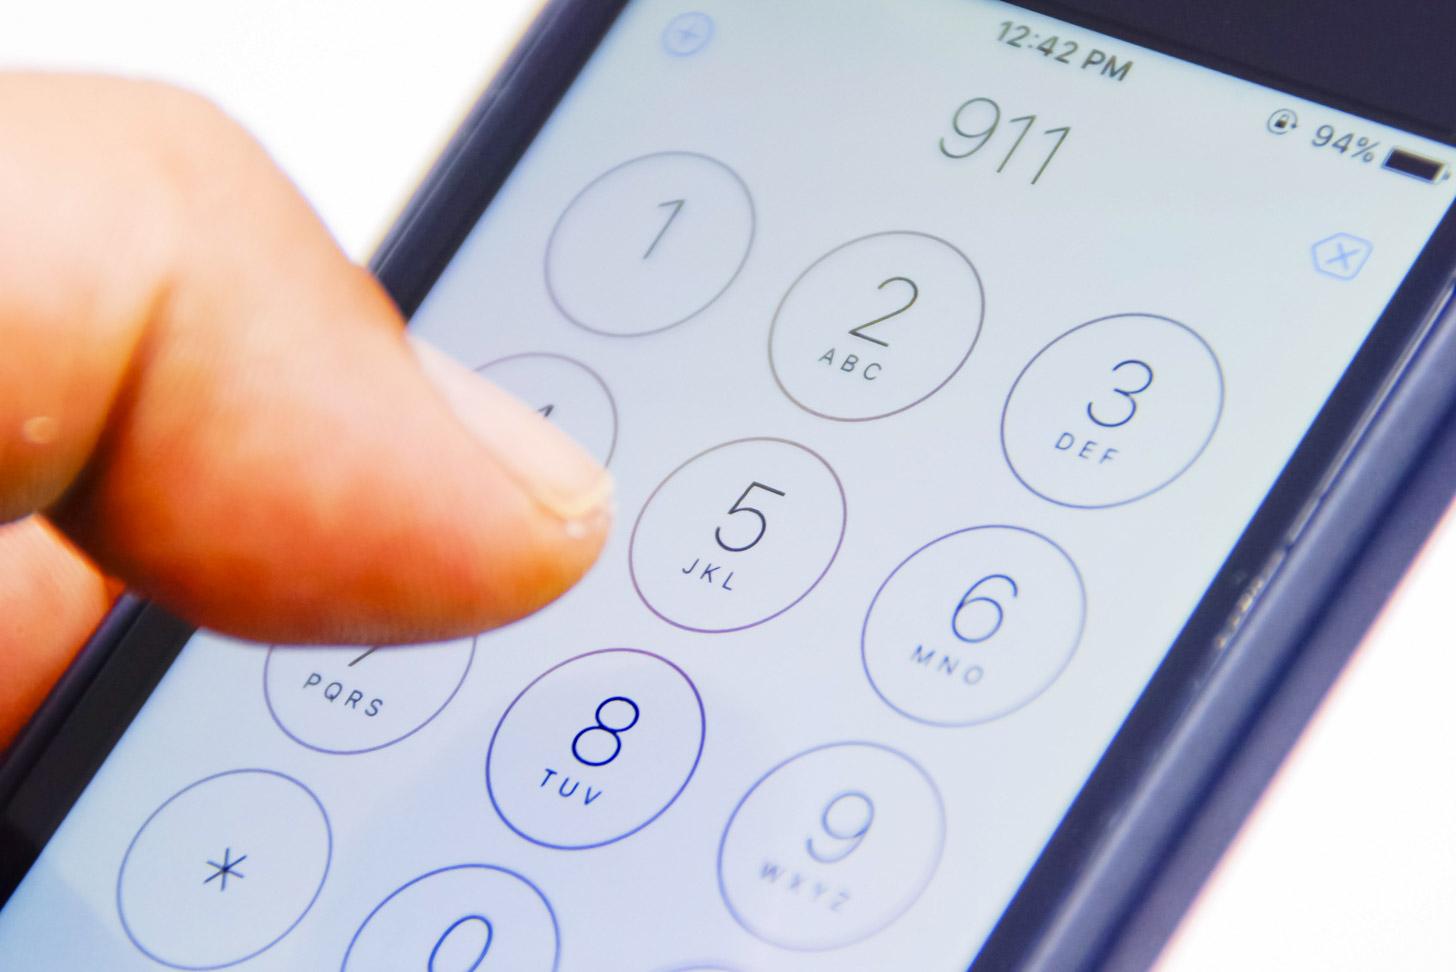 In geval van nood: bel 911